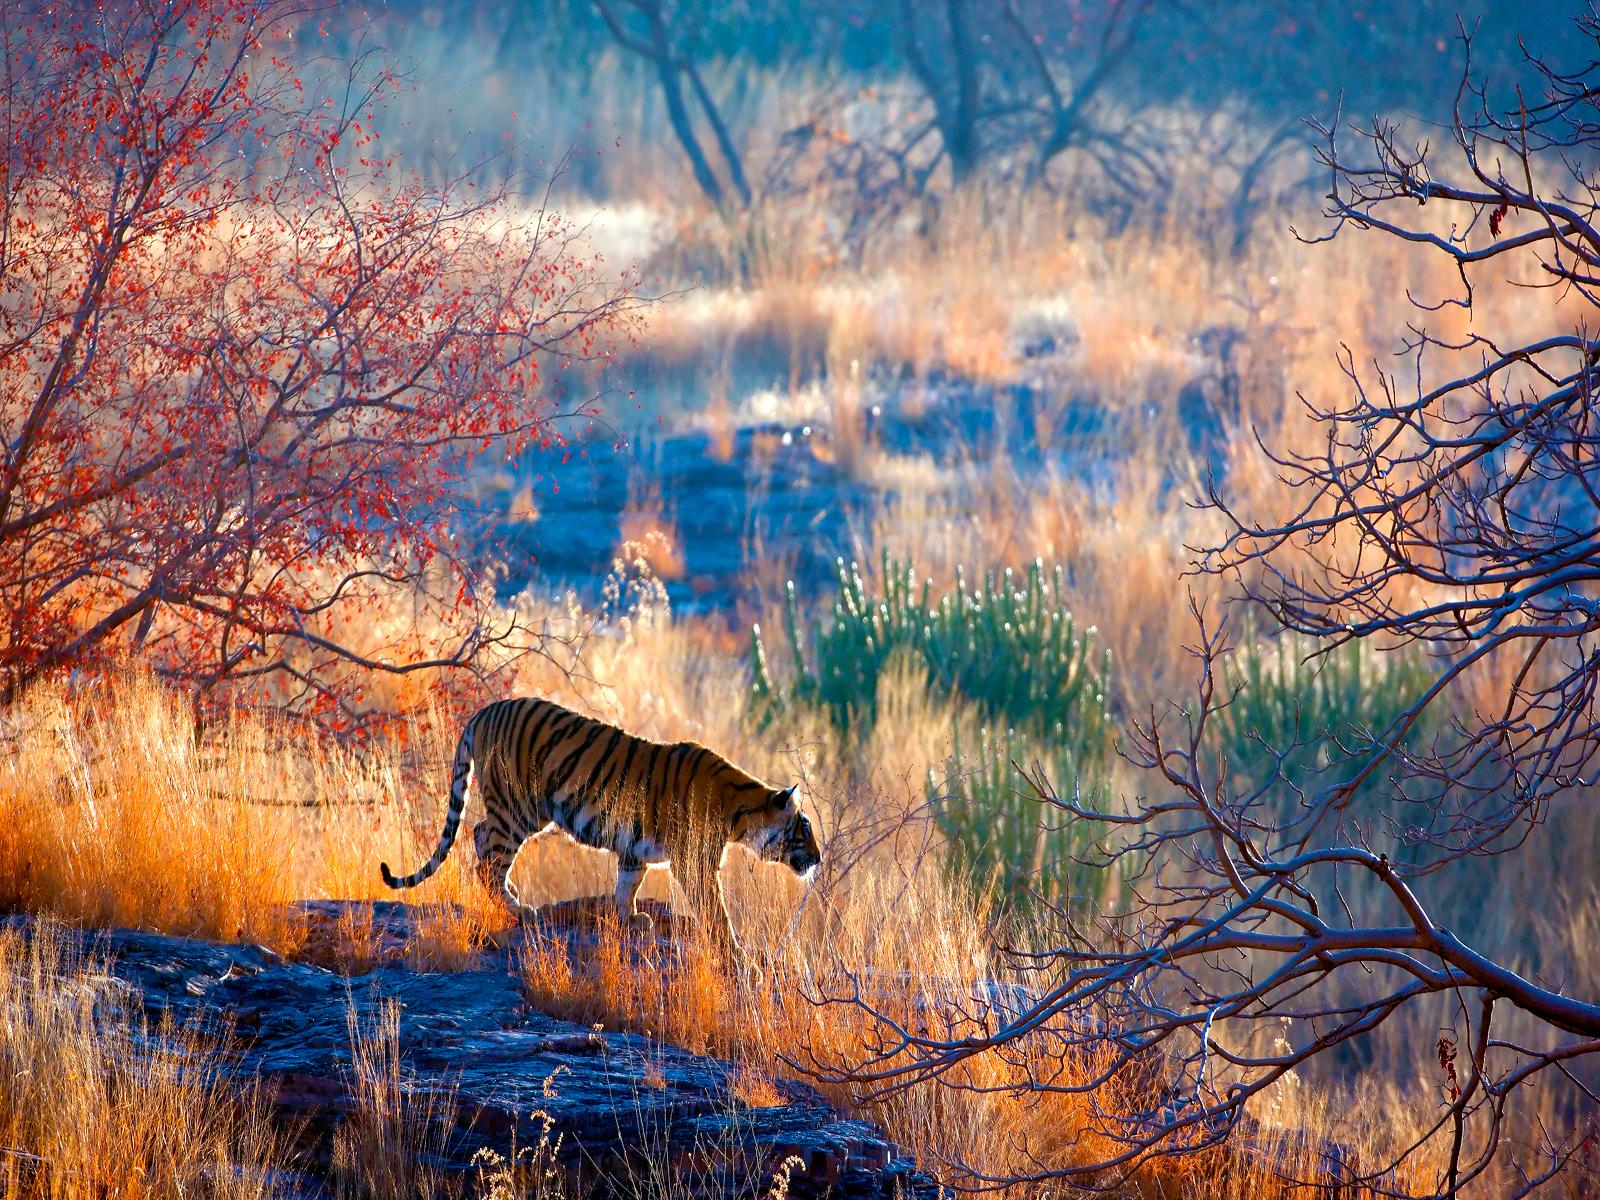 Tiger Kaziranga